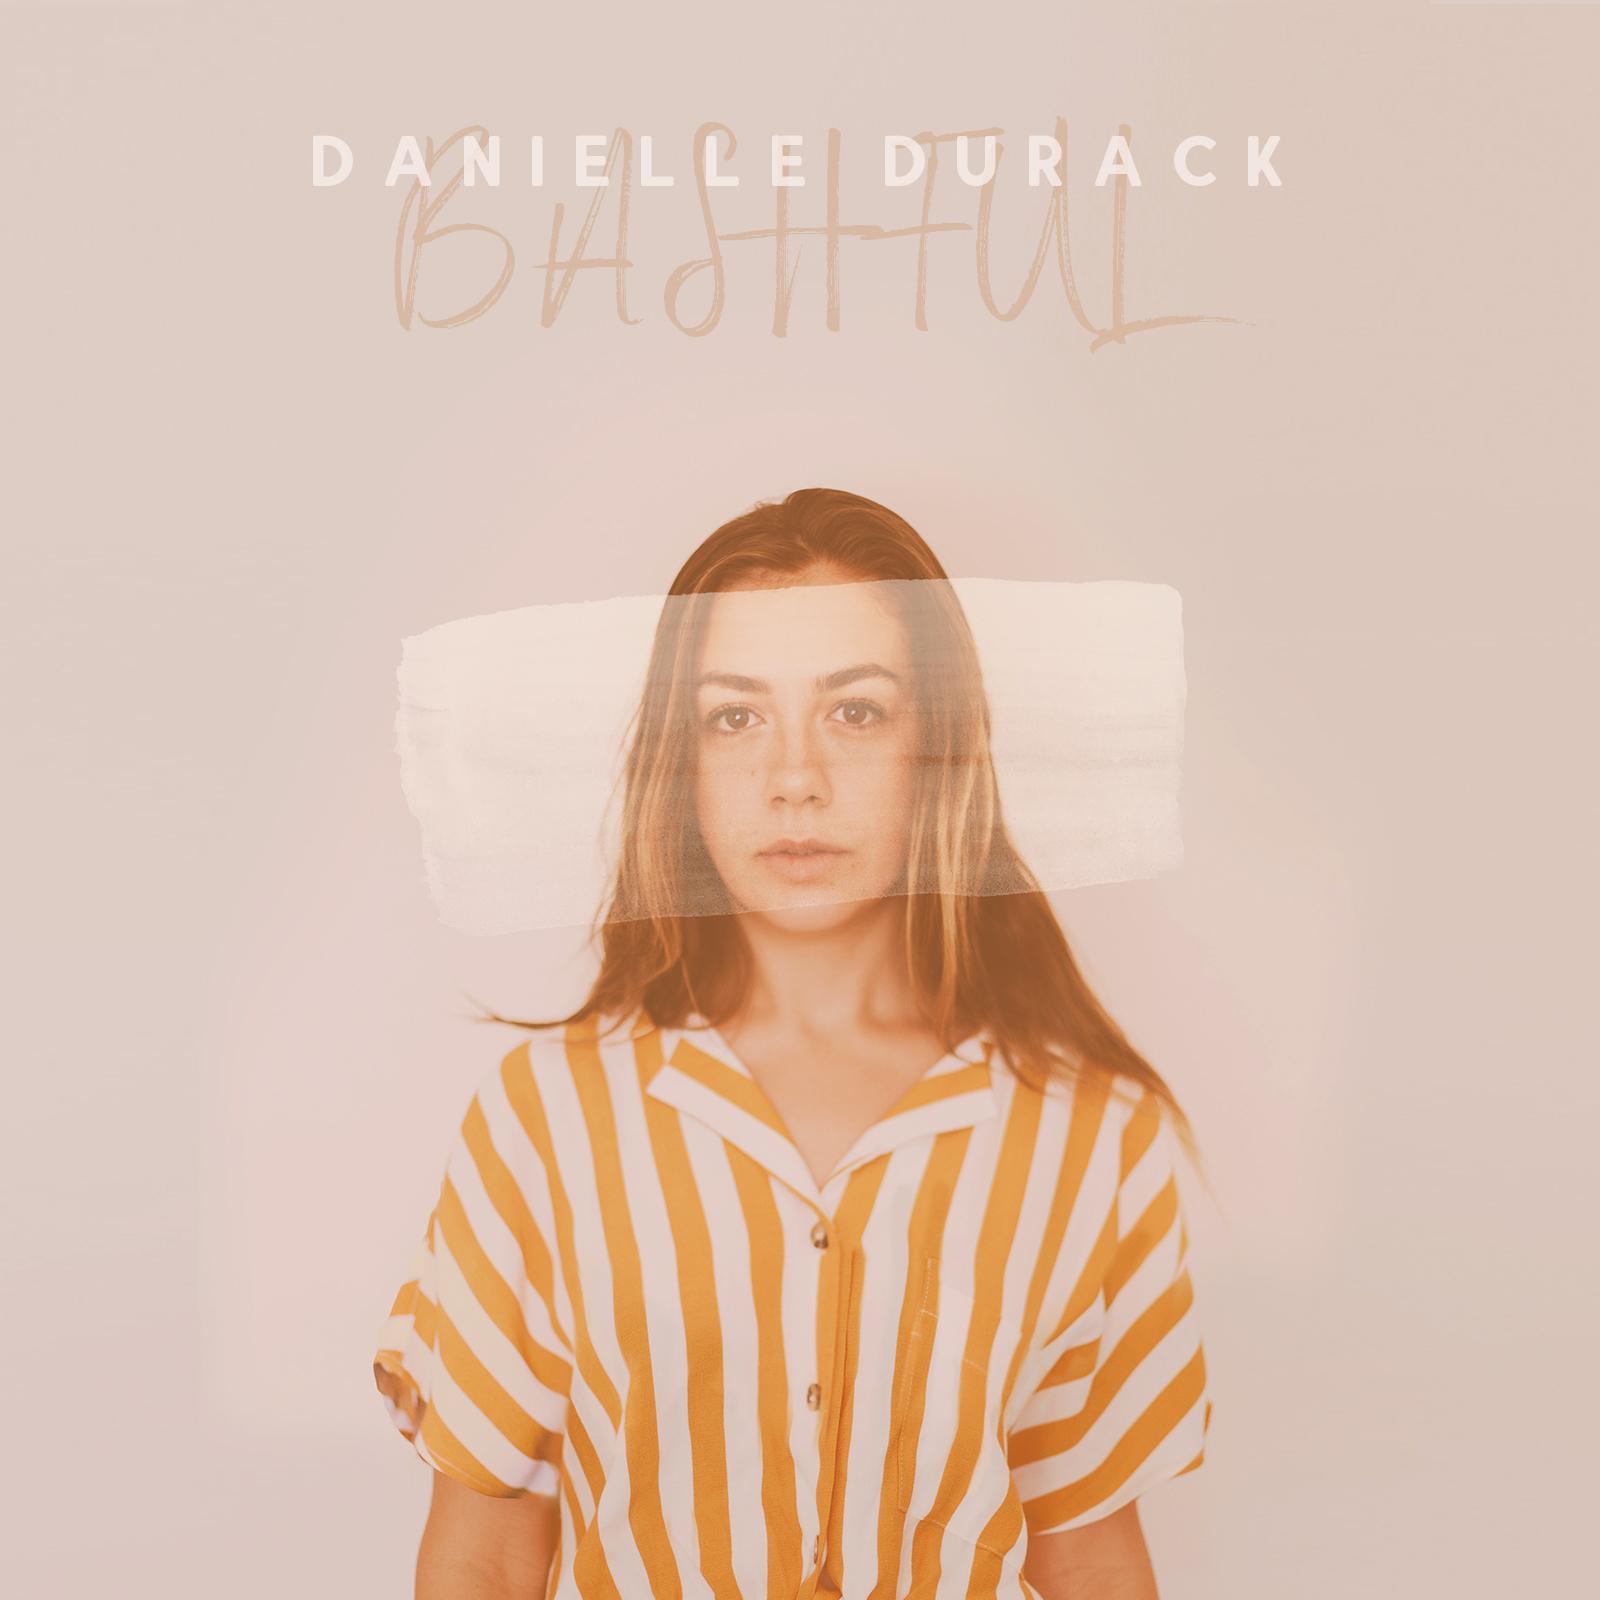 DanielleDurack_Bashful.jpg